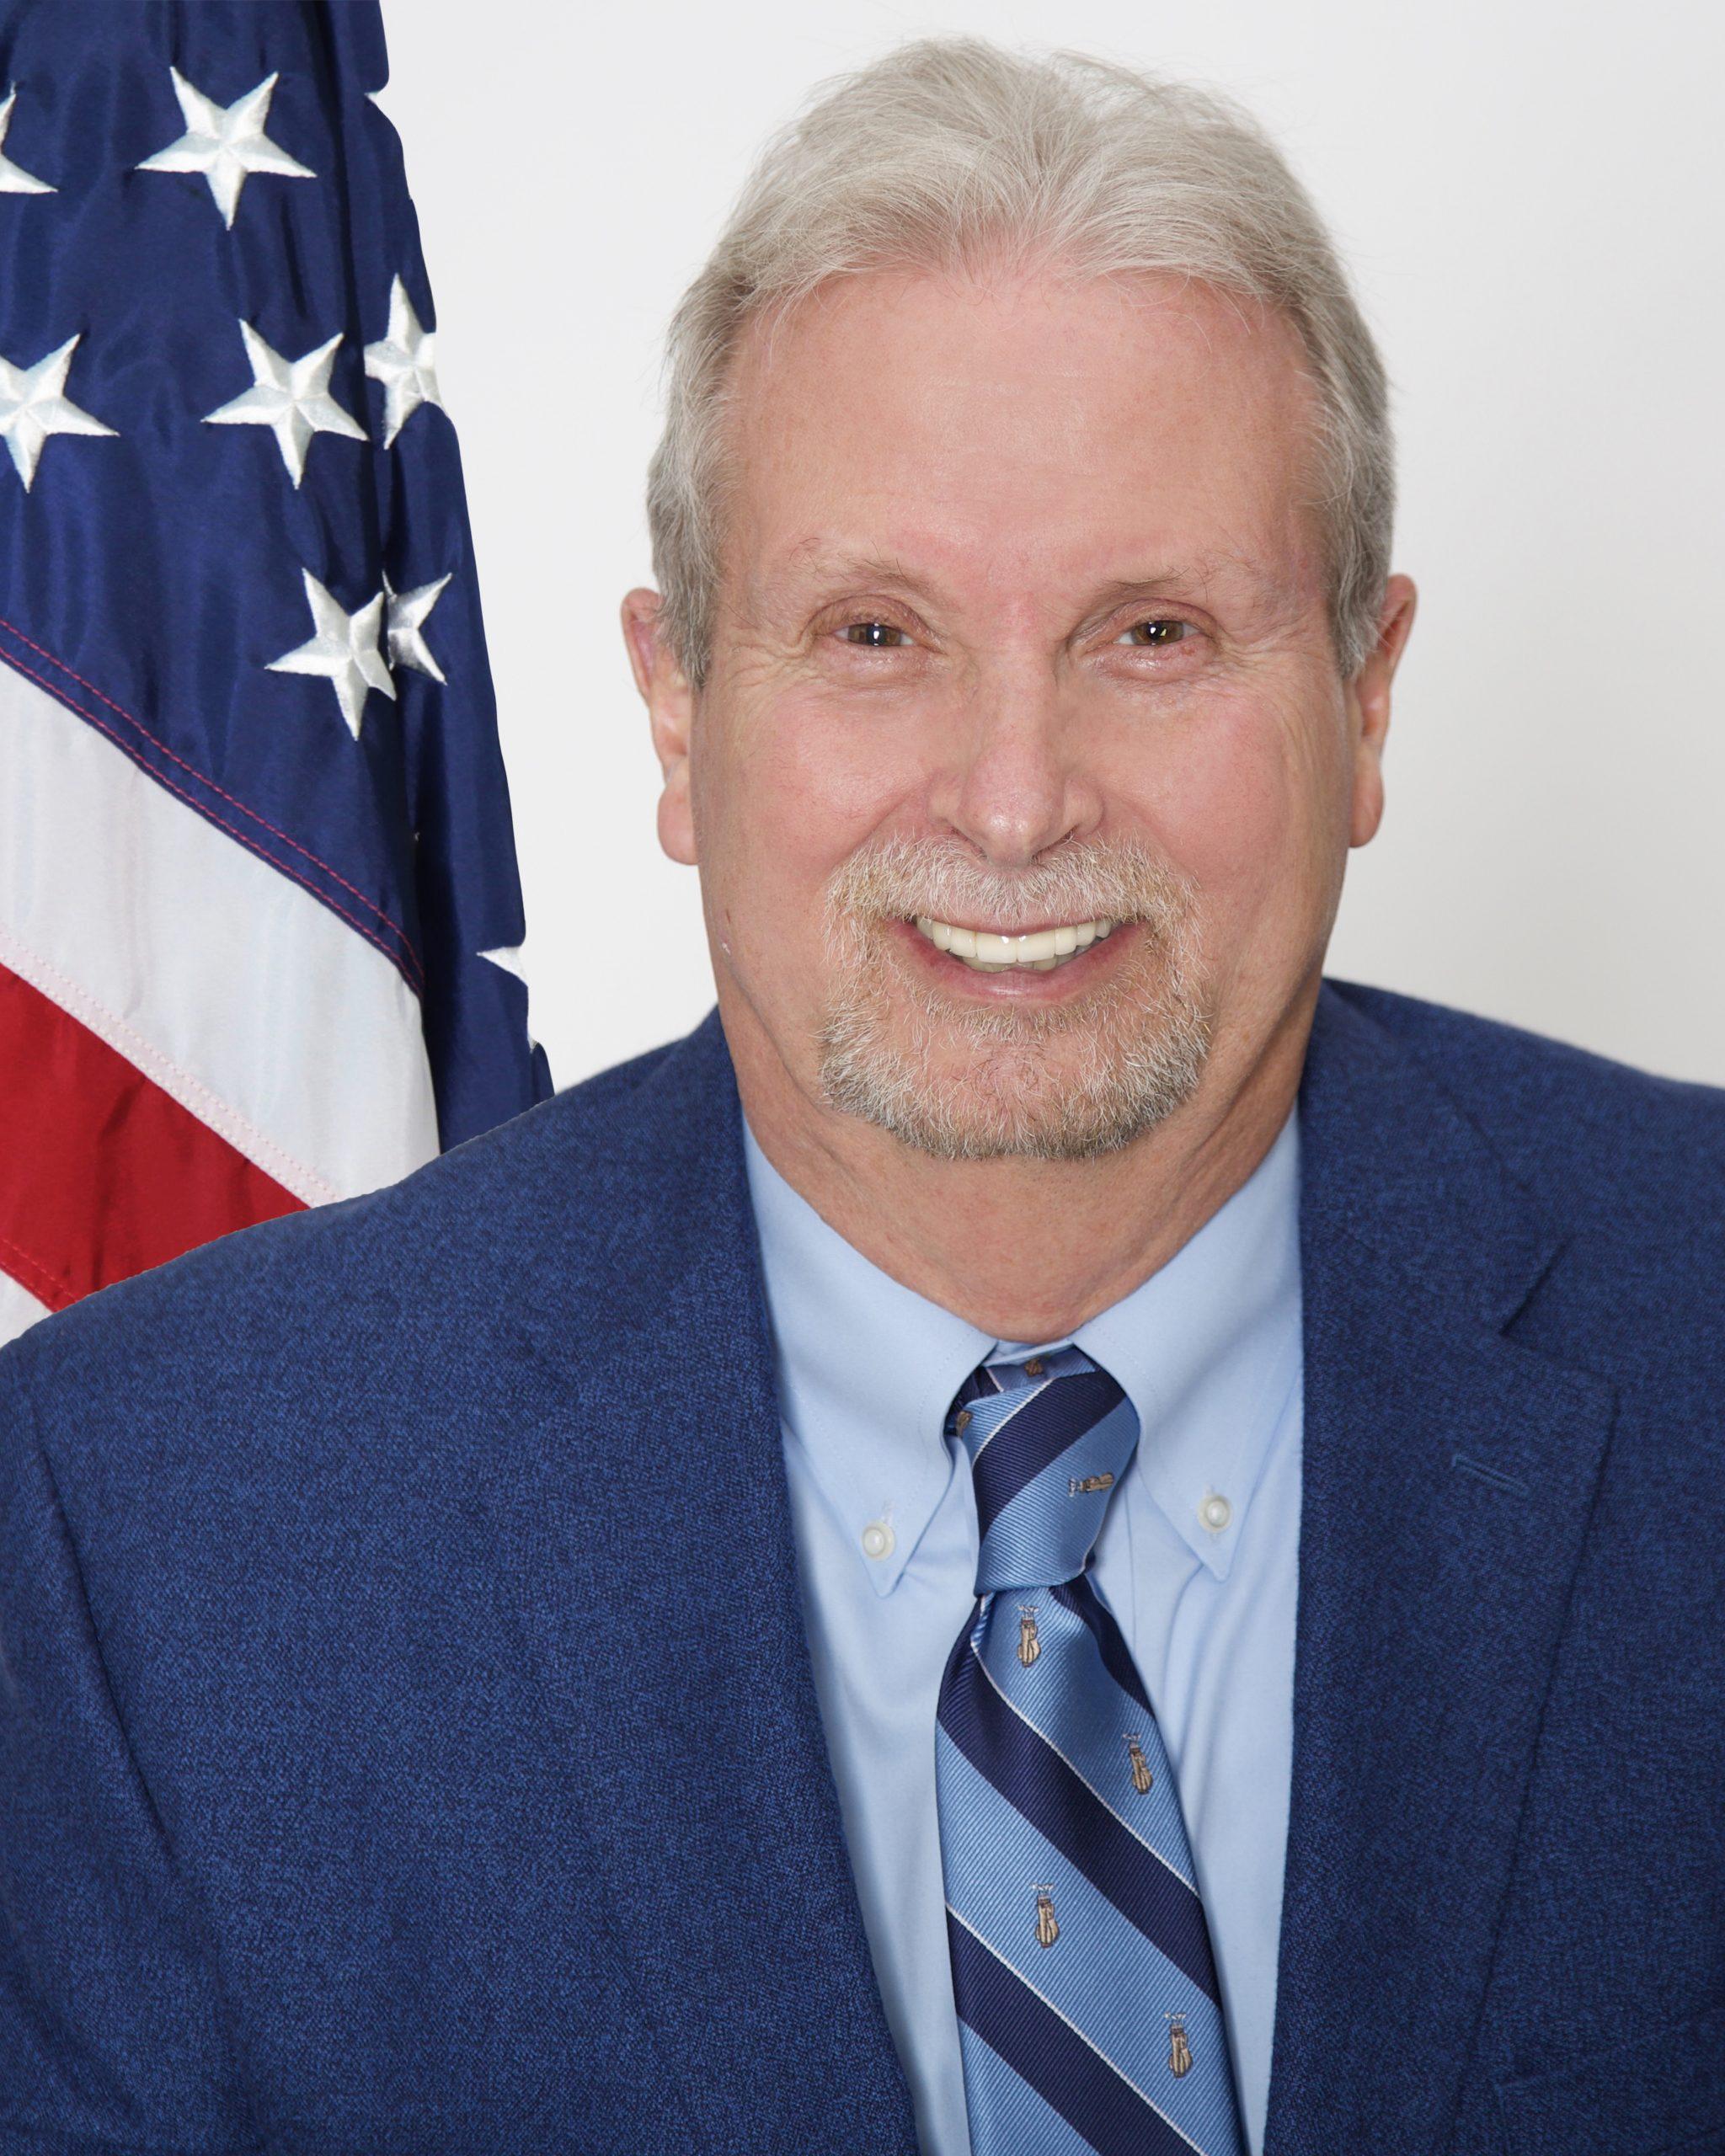 Commissioner Douthirt